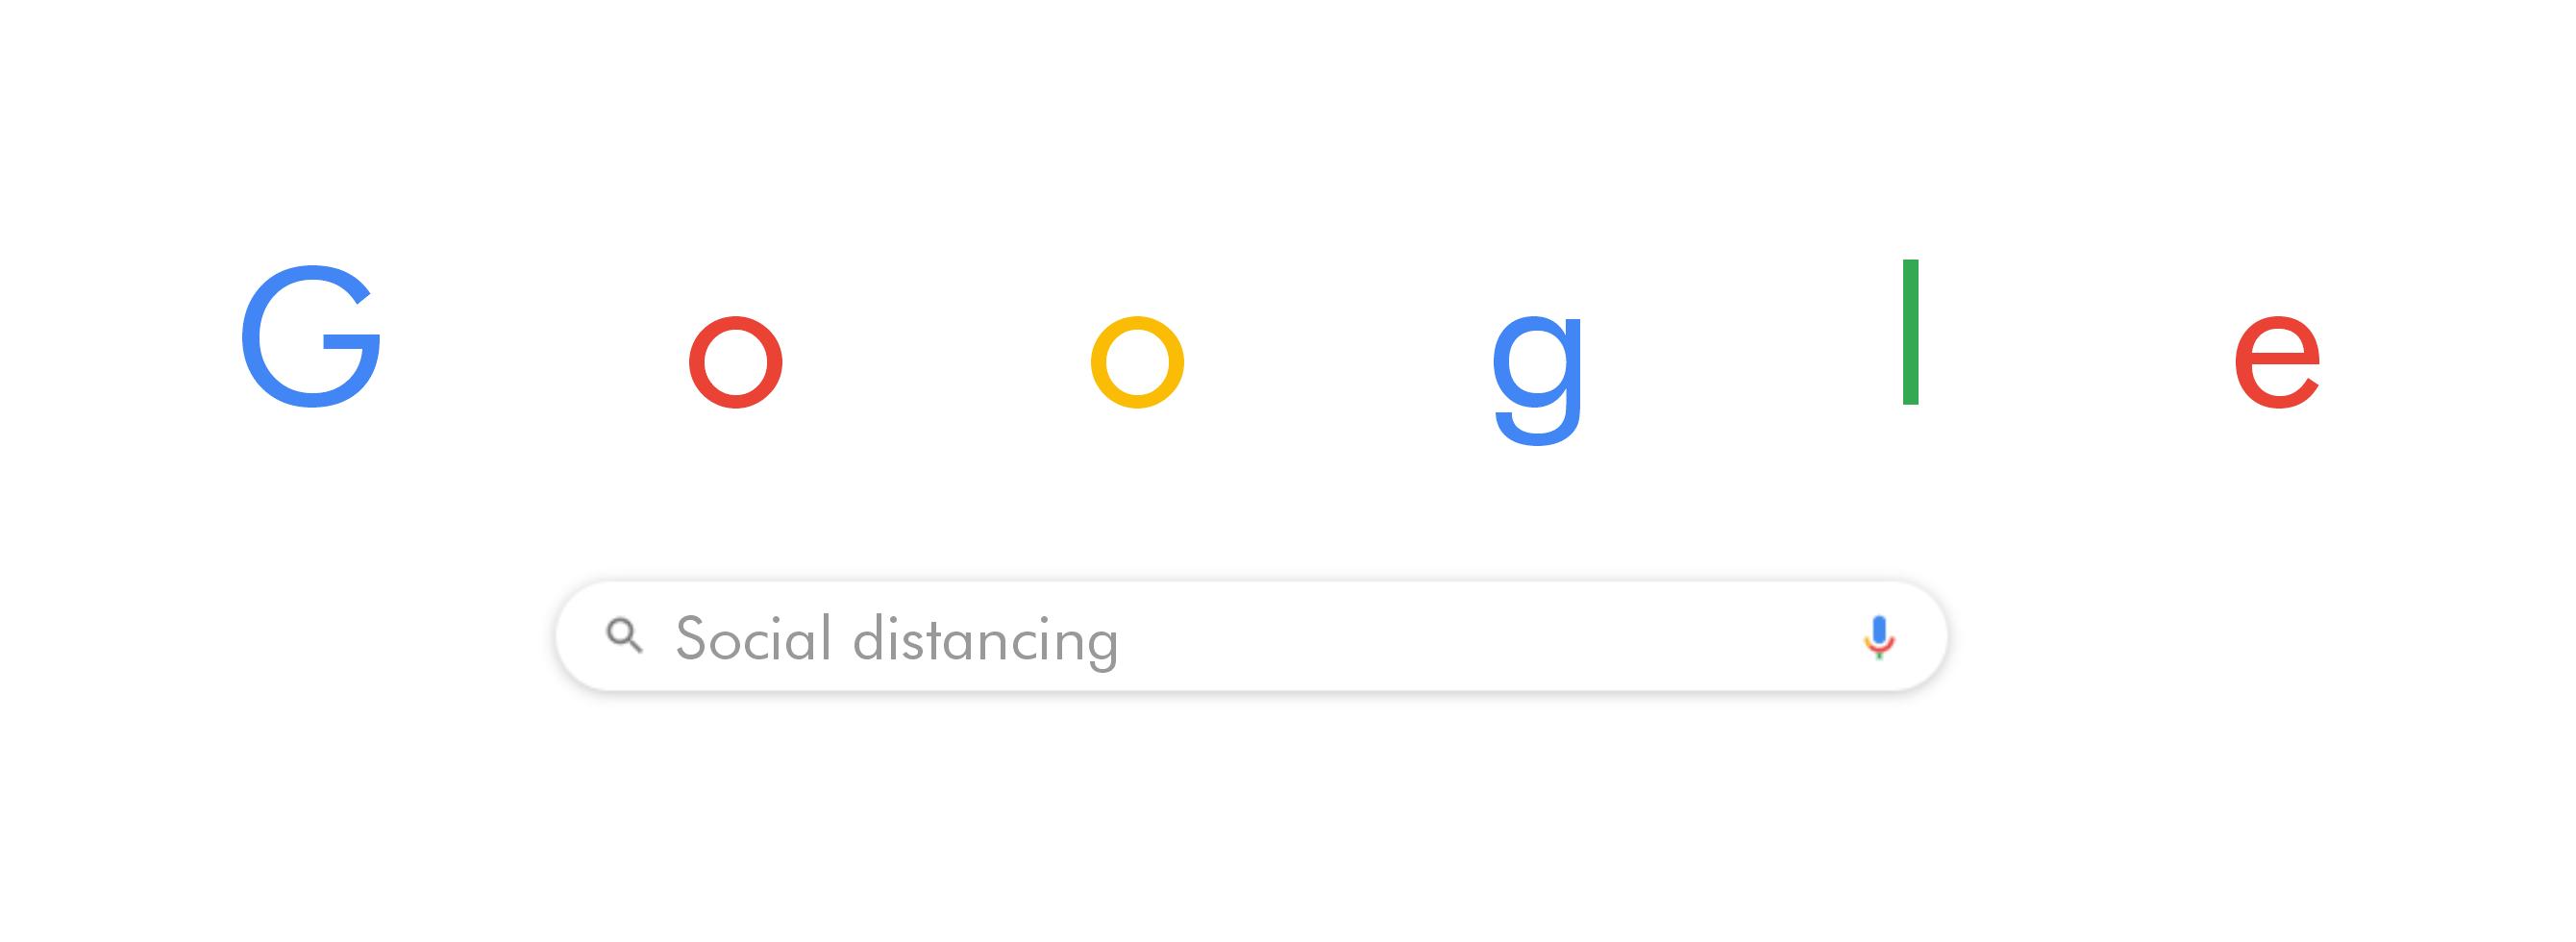 google doodle social distancing concept